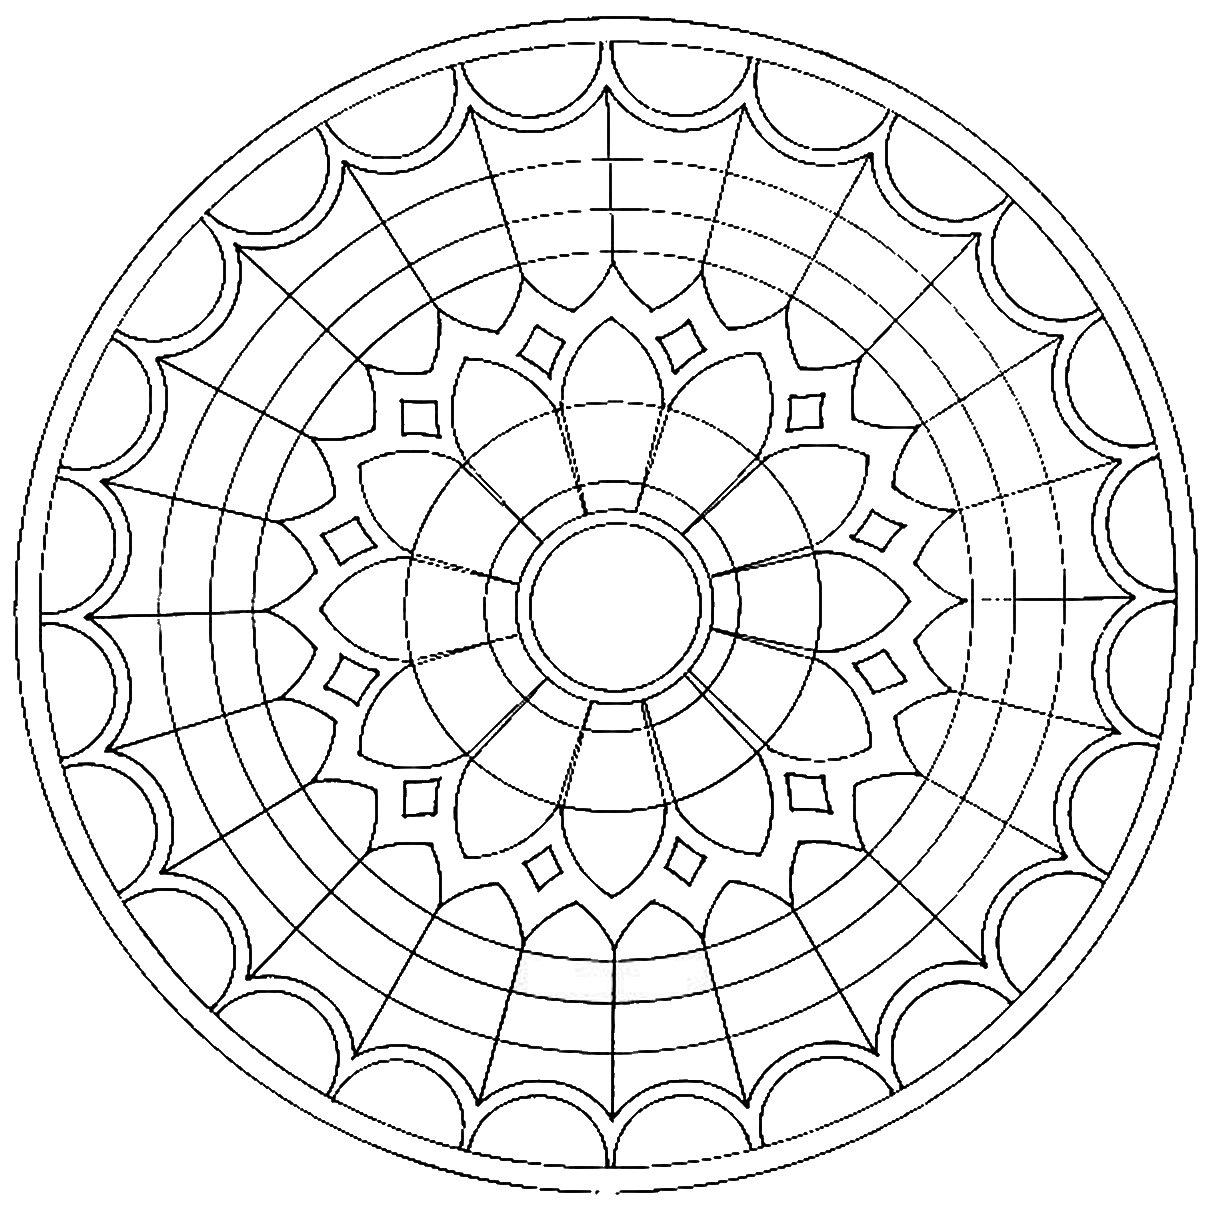 Mandala 16 furnicutele 2012 2013 - Modele de mandala ...